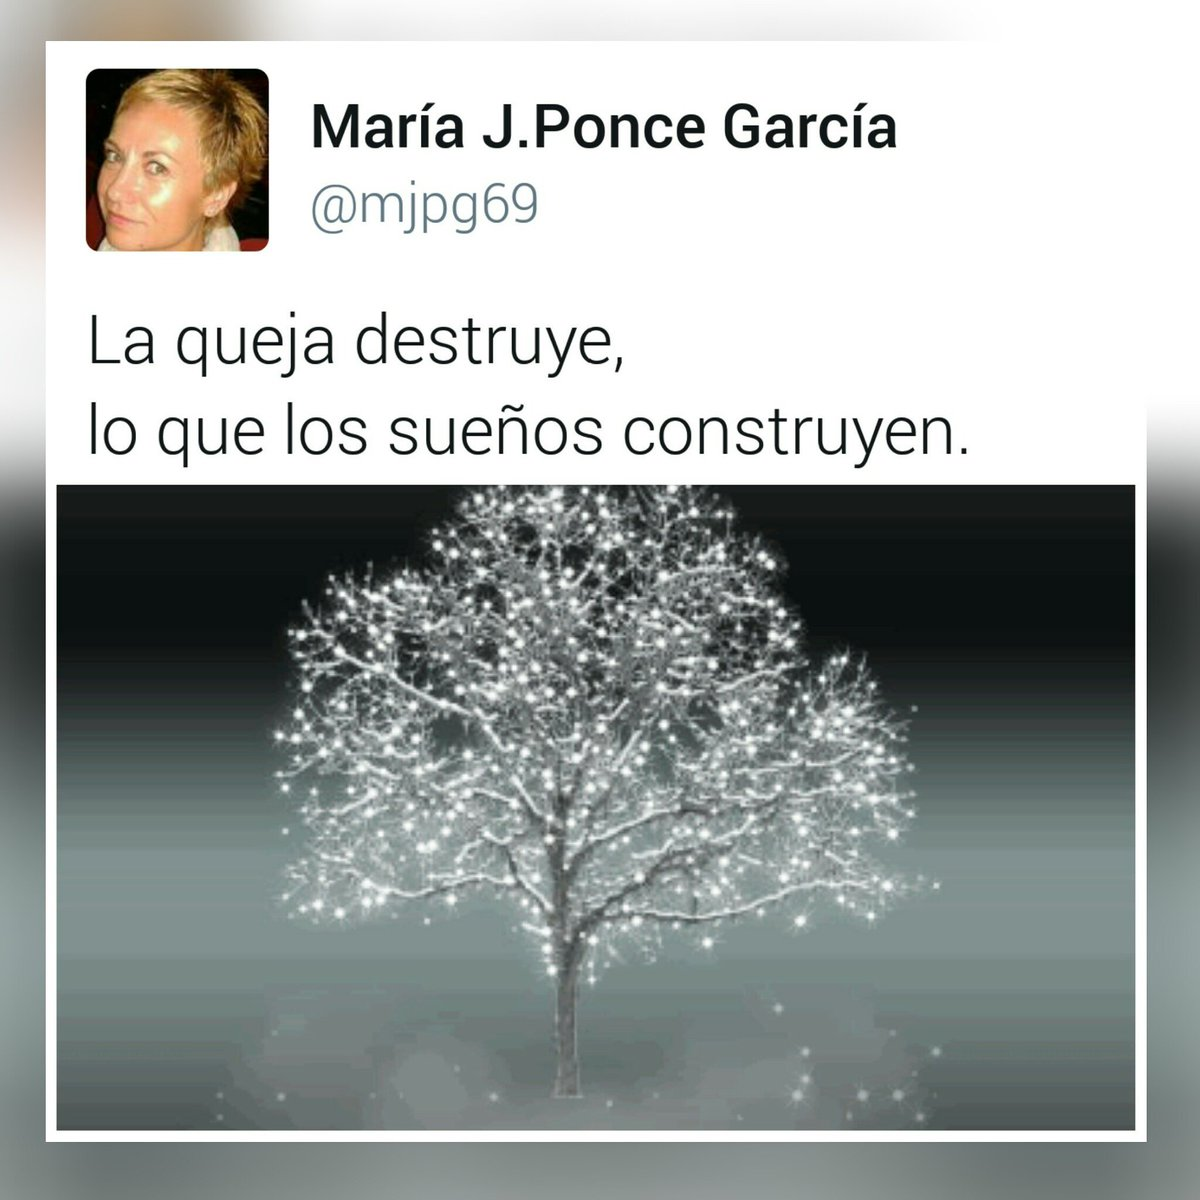 RT @mjpg69: #Sueños https://t.co/KIjwExoEhP